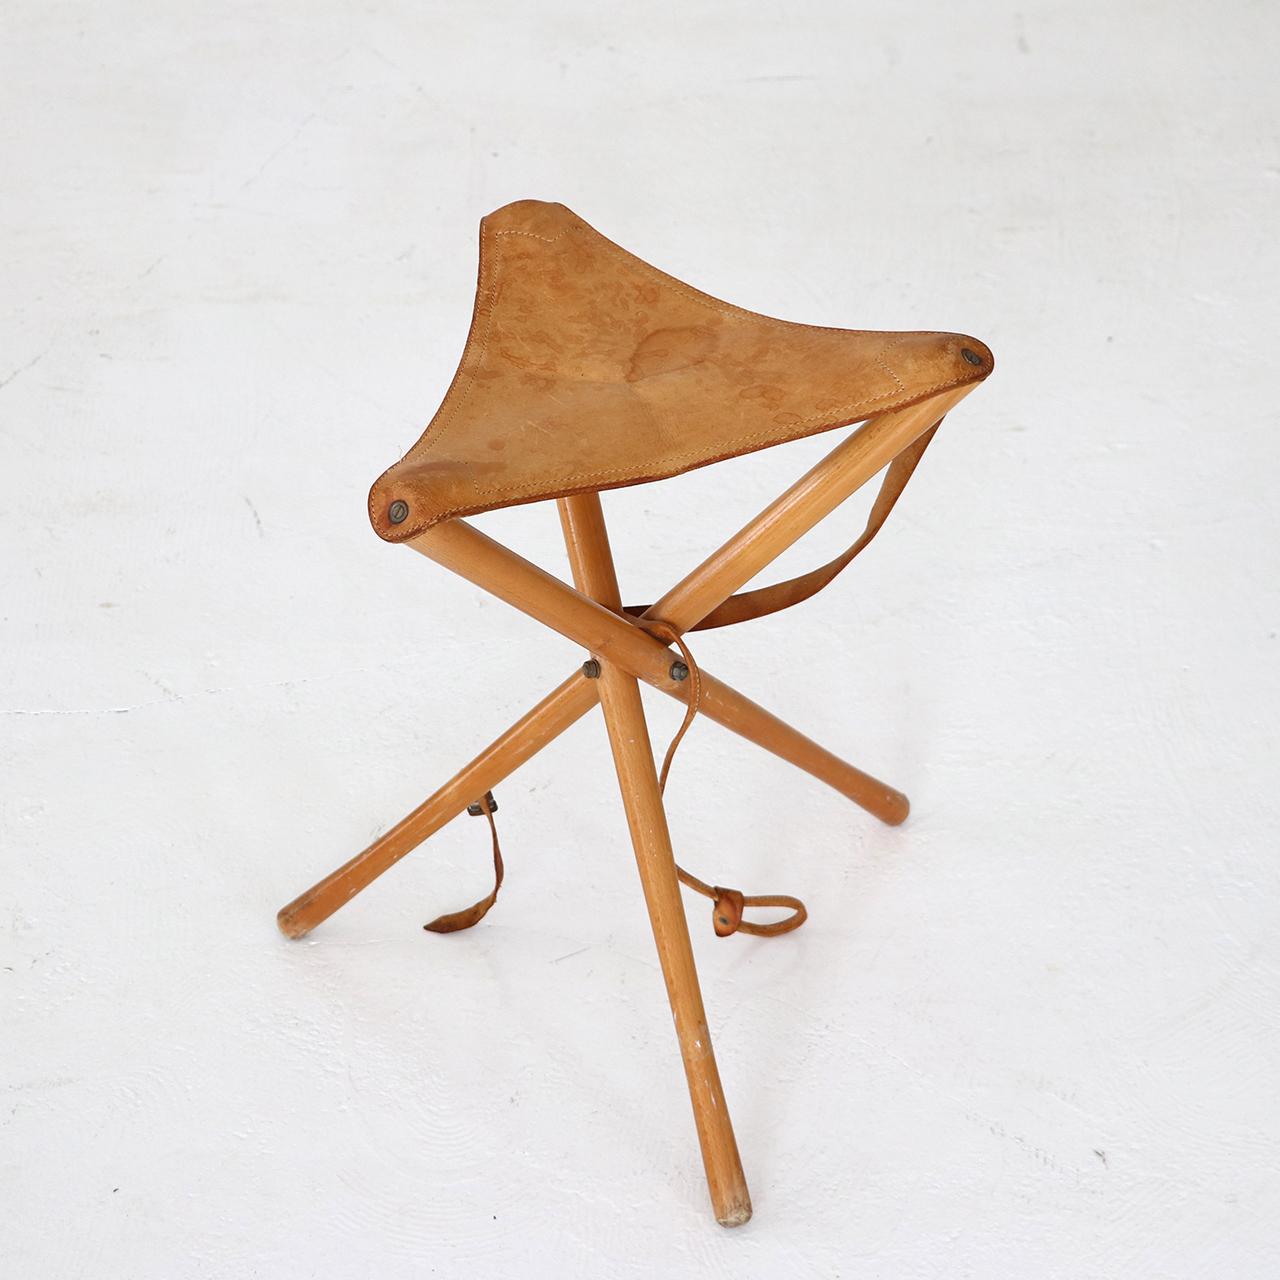 Hunting stool